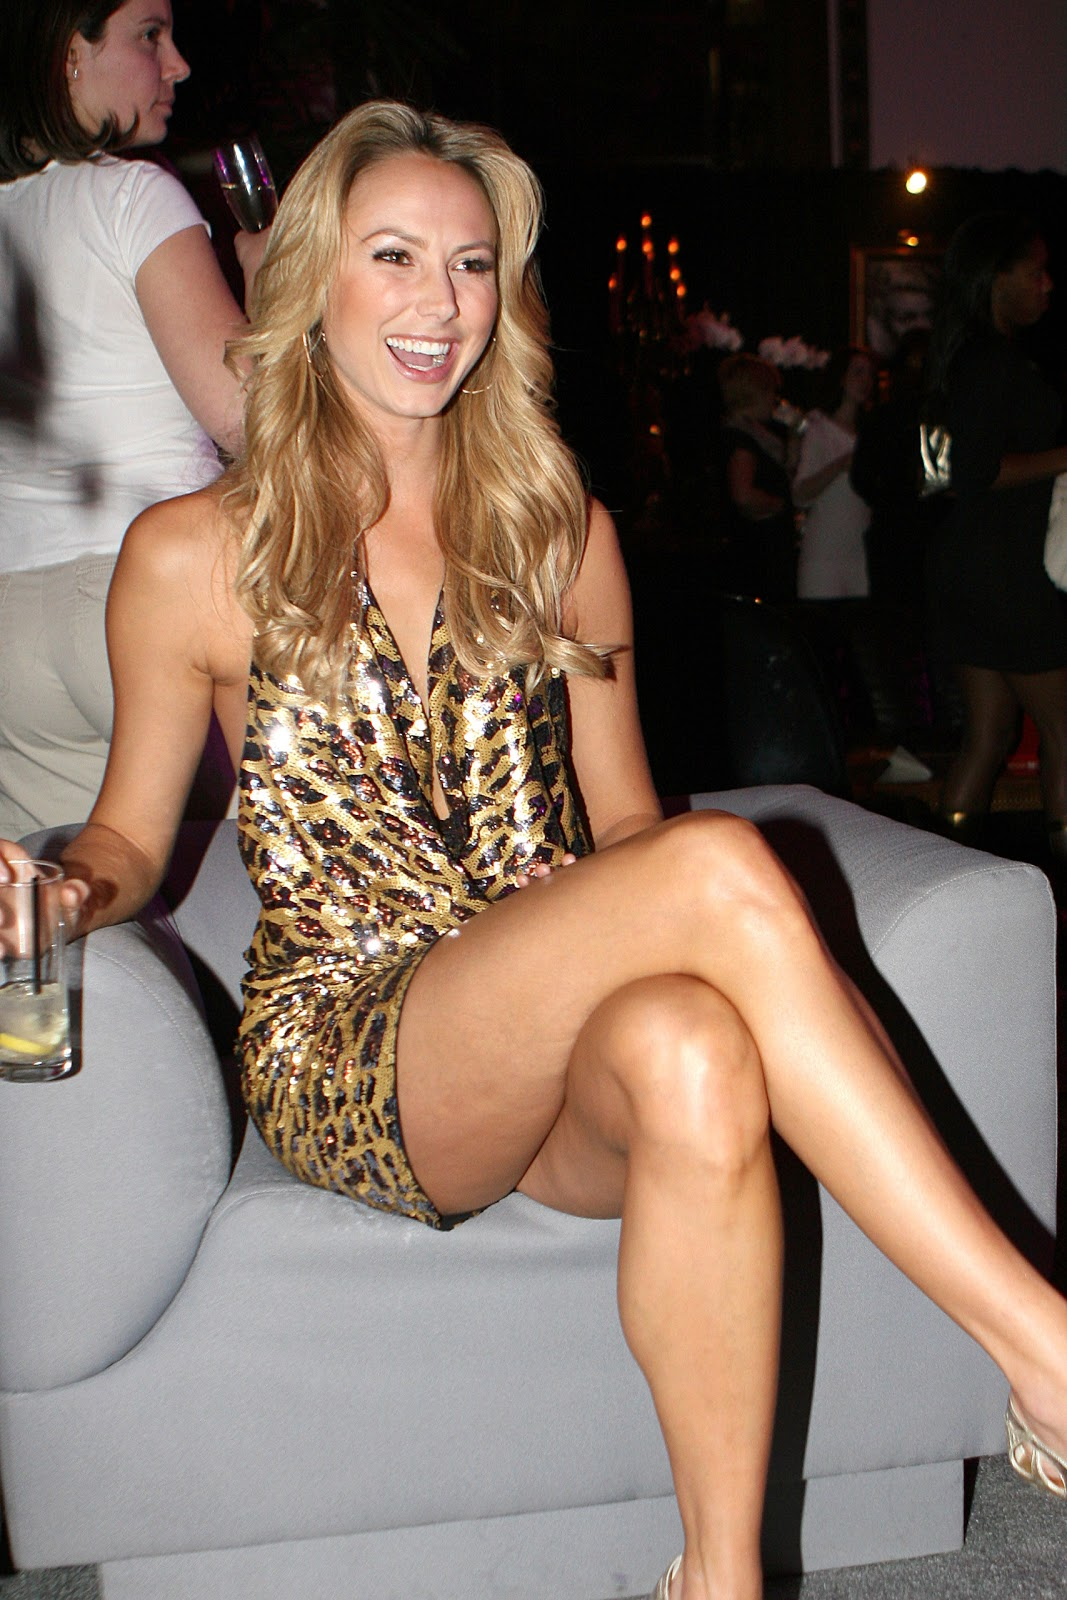 Sexy Legs Movies 100